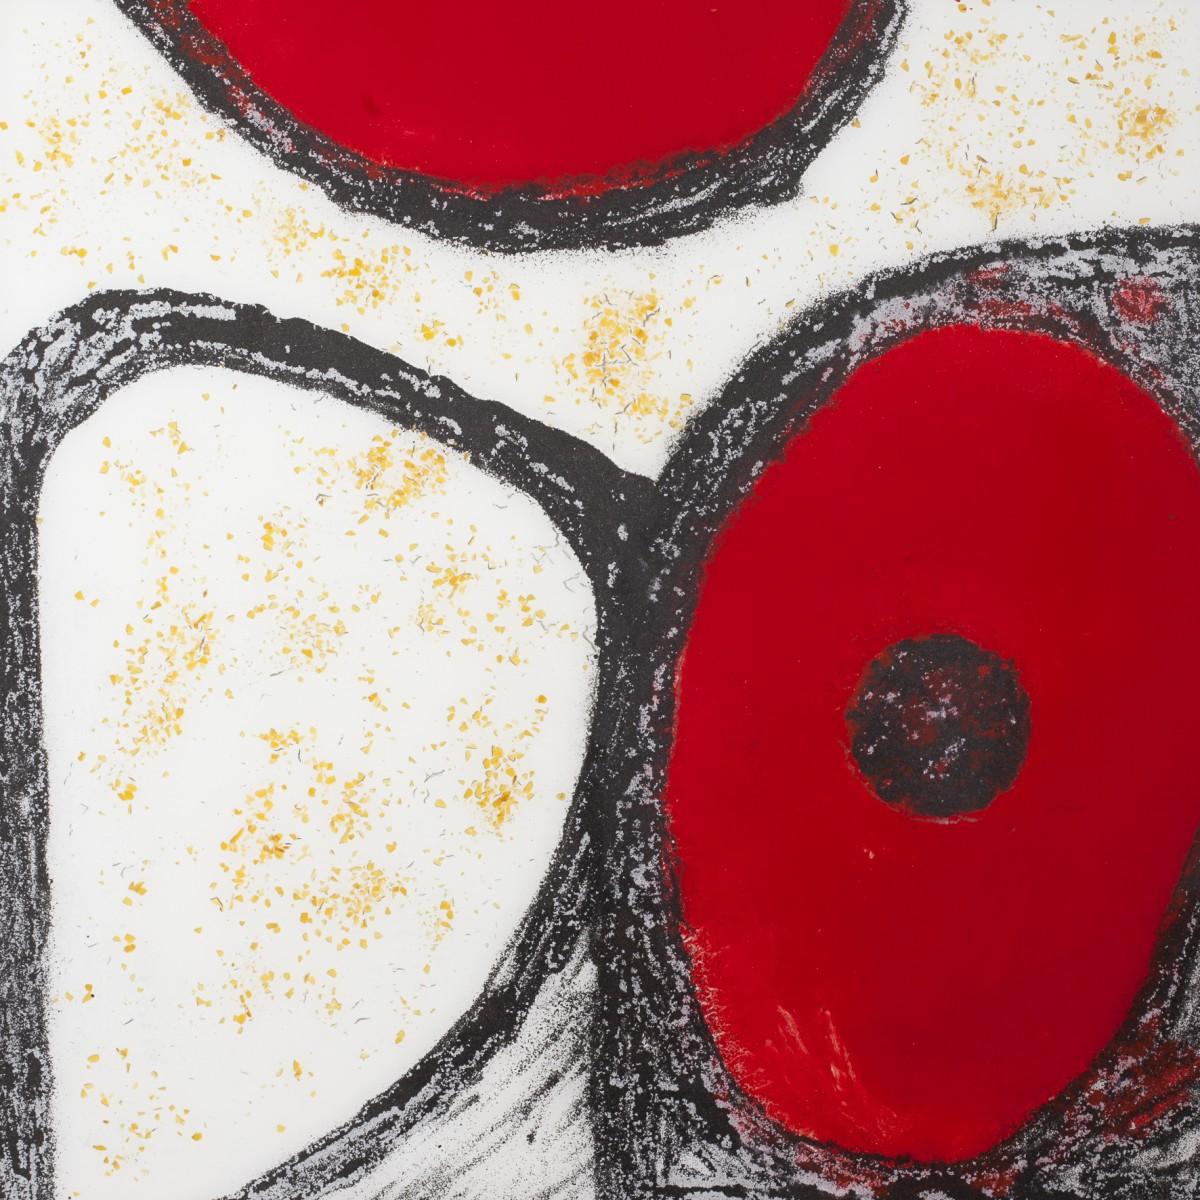 rot siegt, 2016 © Ralph Petznick